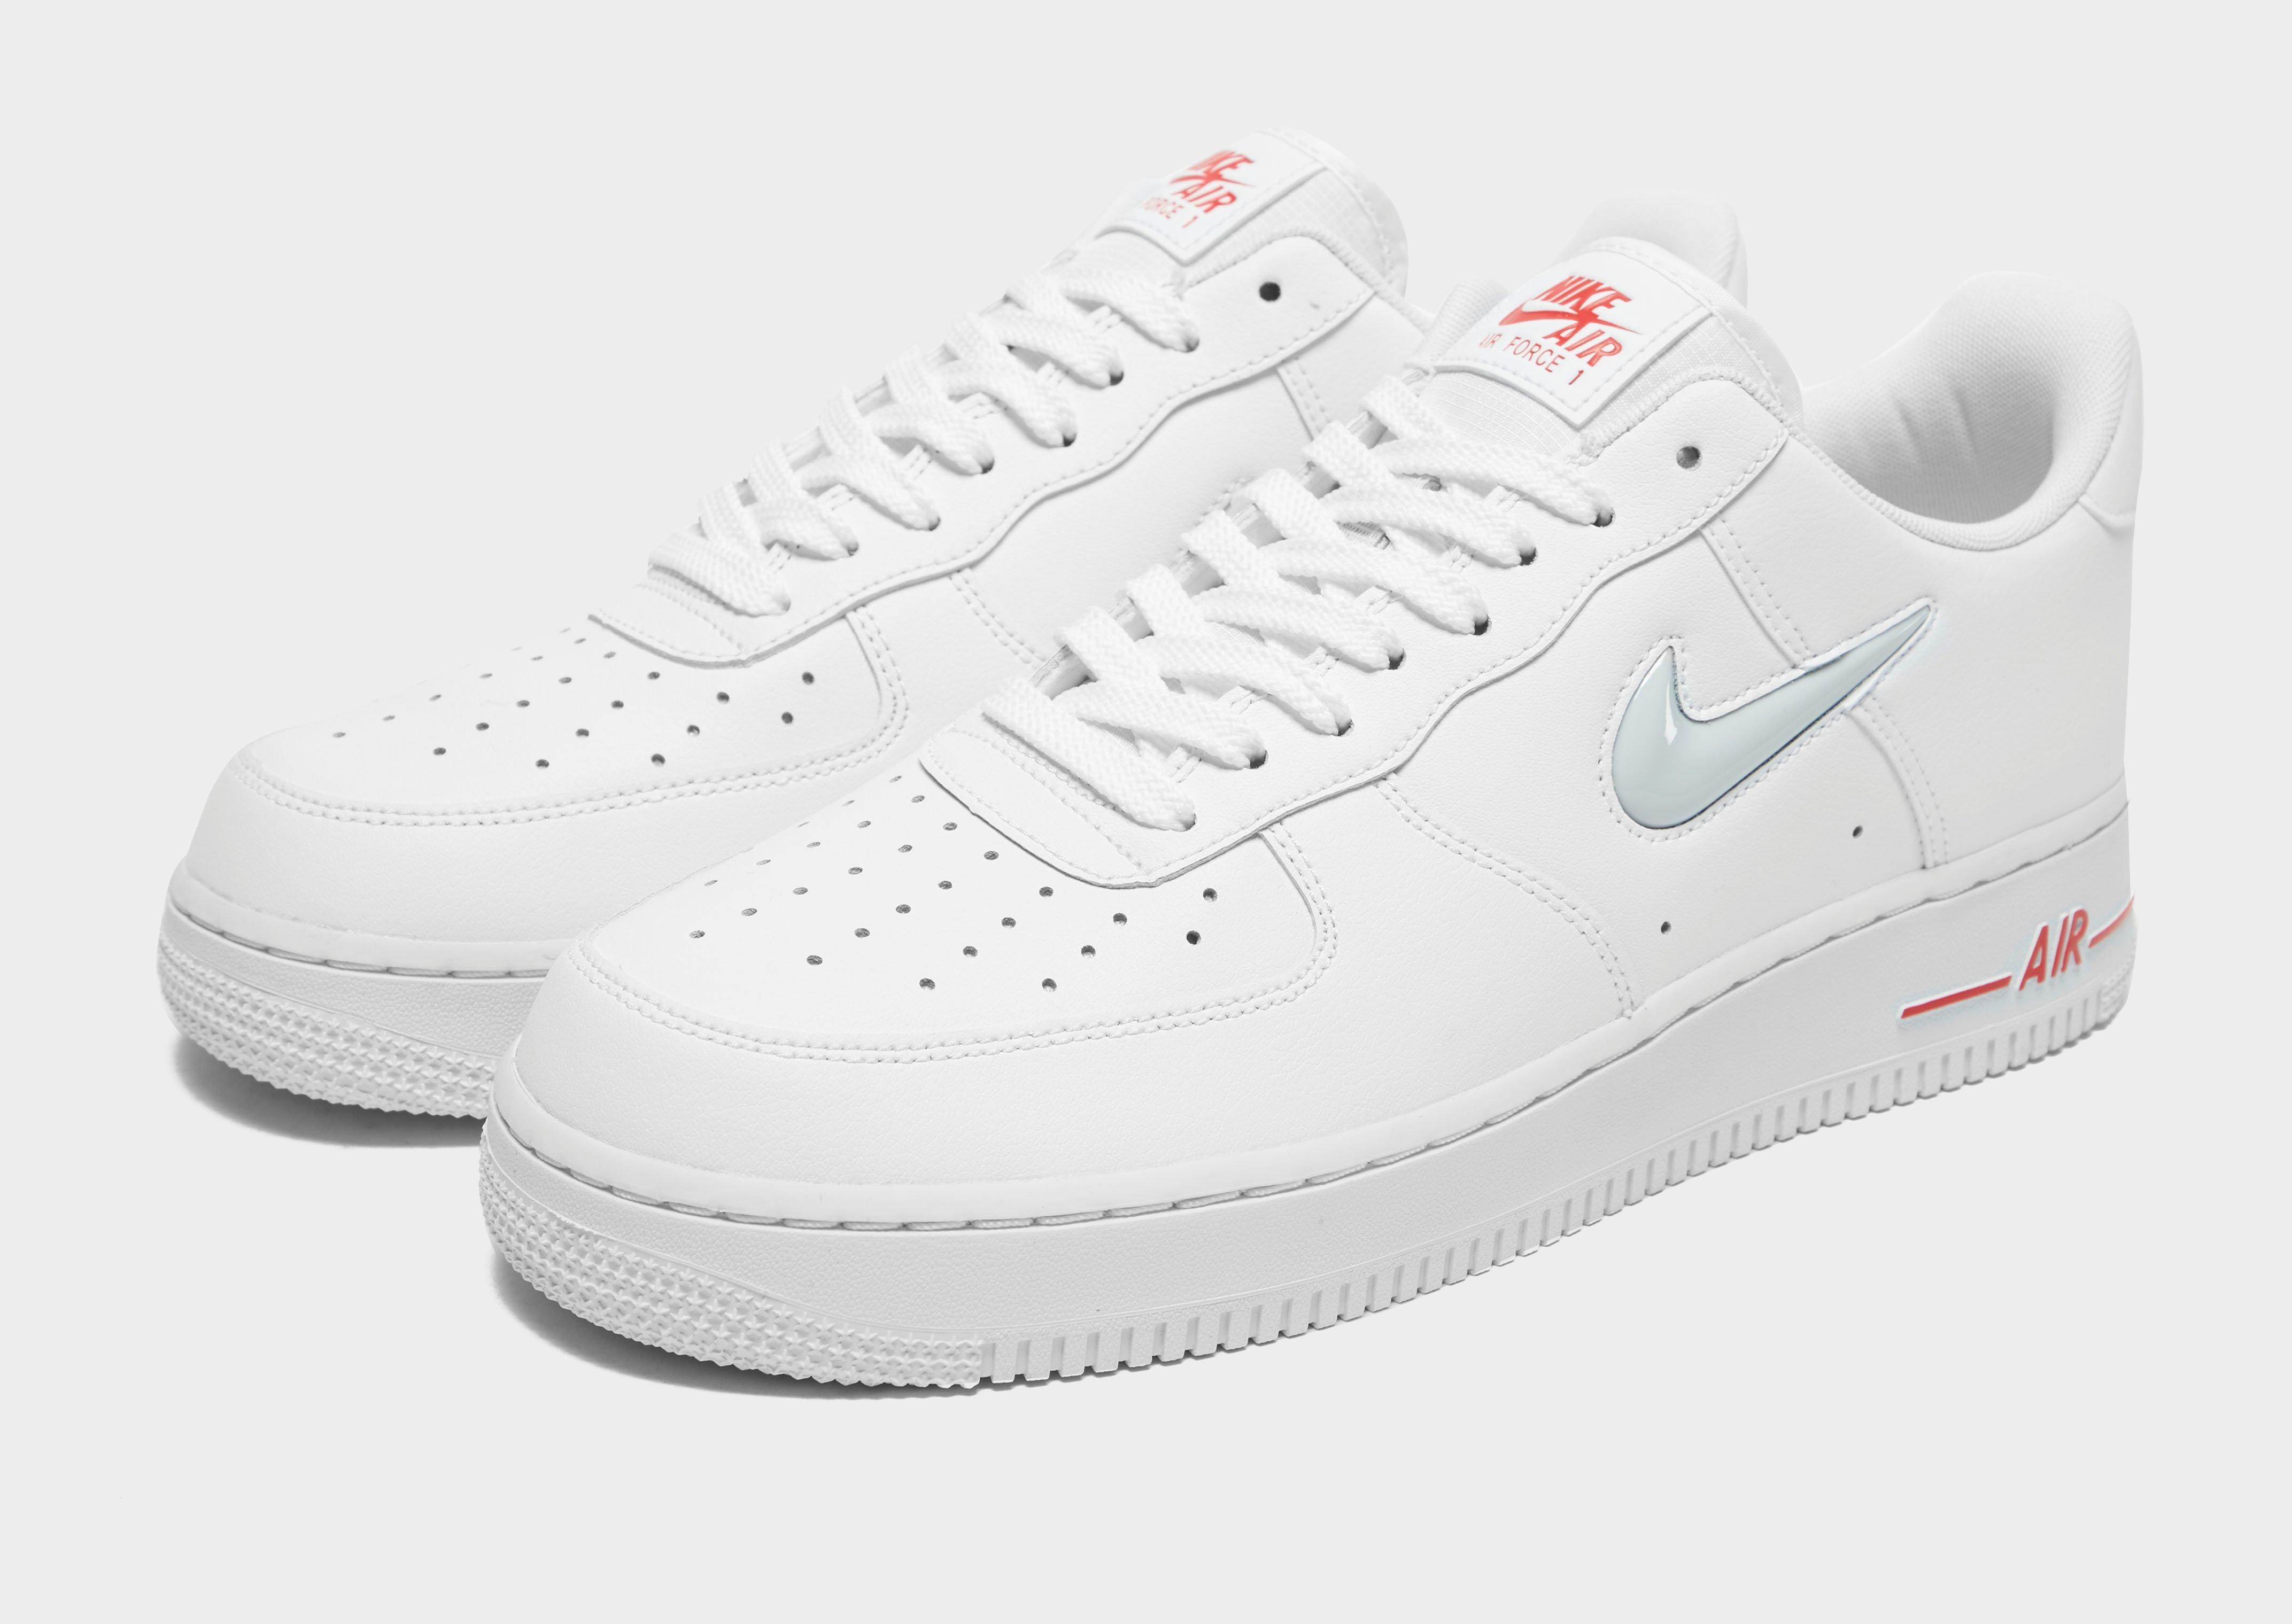 air force 1 jewel white